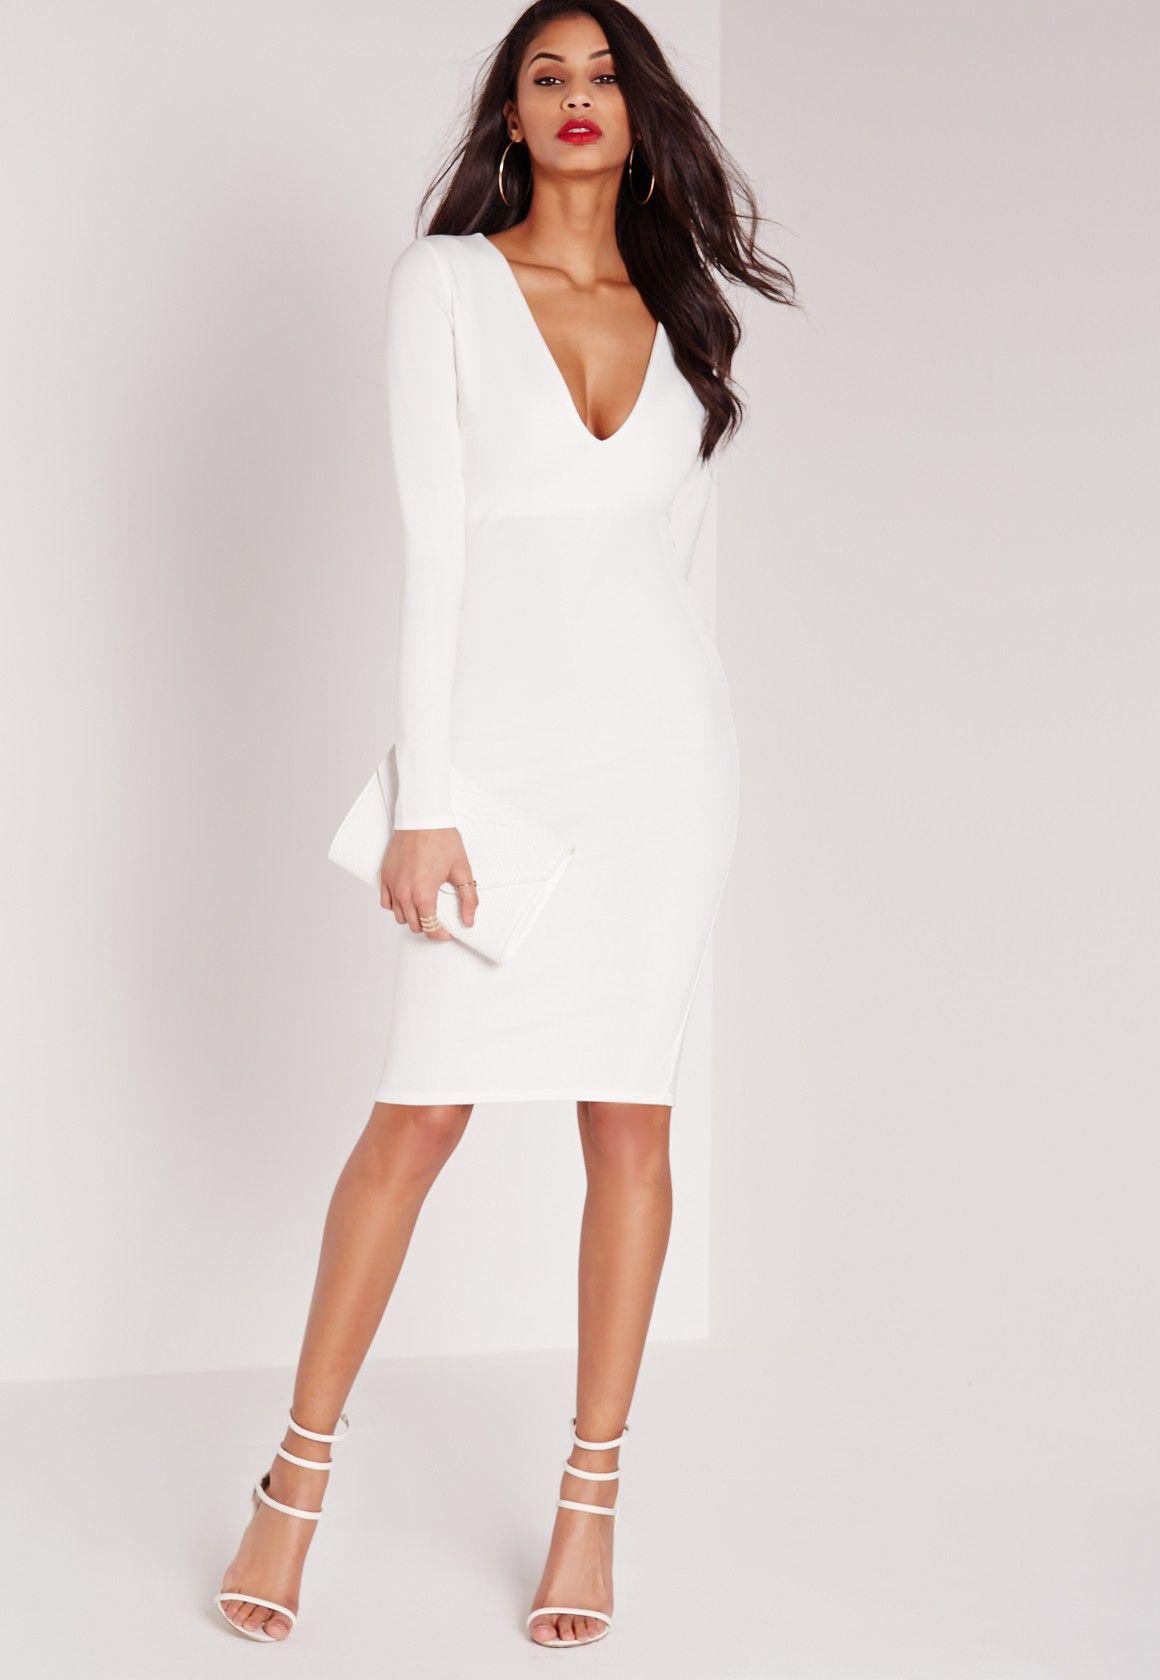 Missguided Ponte Long Sleeve Plunge Midi Dress White Plunge Bodycon Dress White Midi Dress Lace White Dress [ 1680 x 1160 Pixel ]